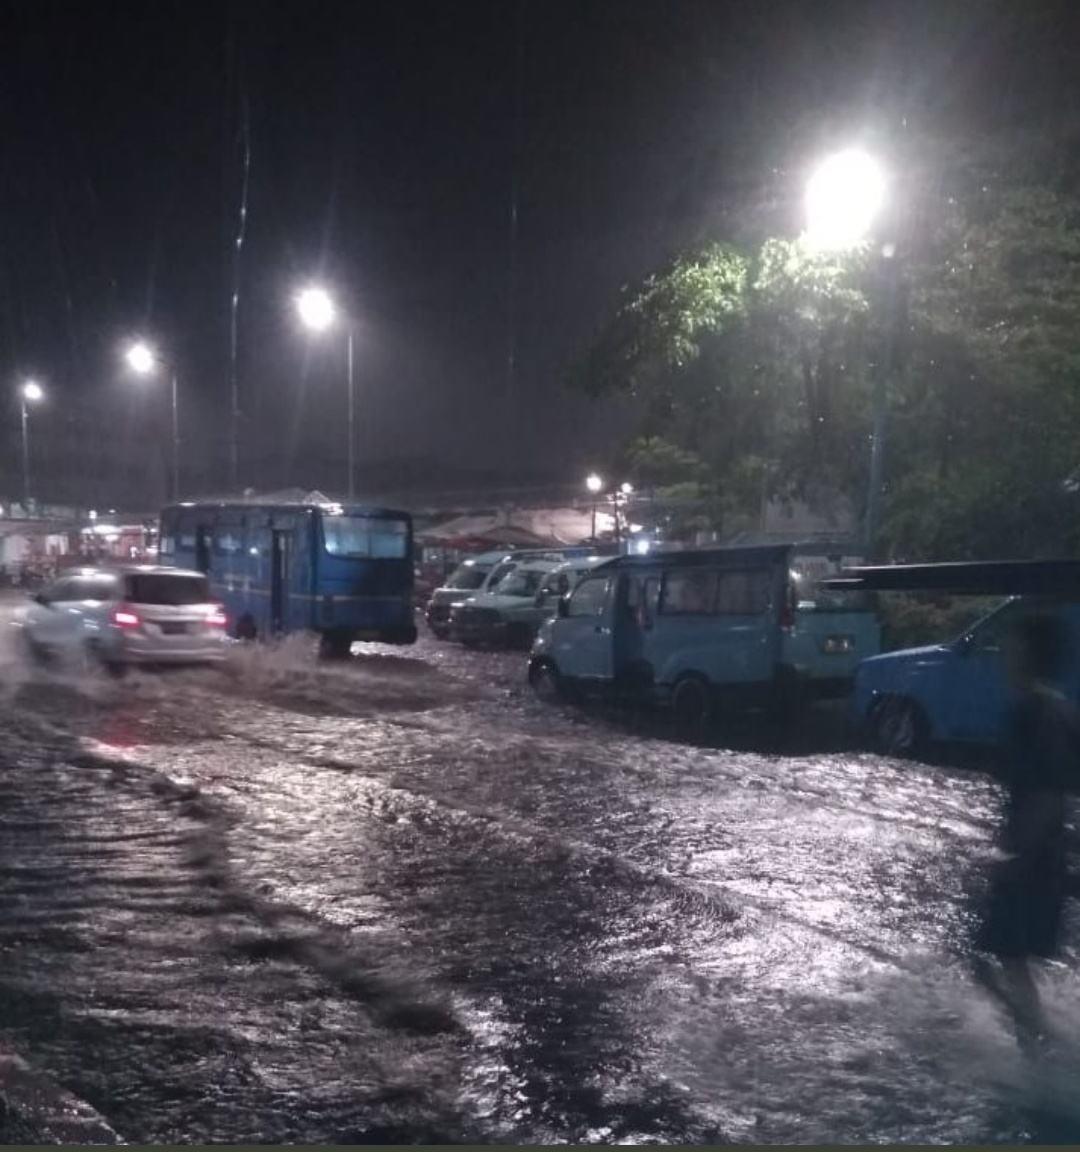 Banjir di Jakarta Barat, Warga Evakuasi Perabotan